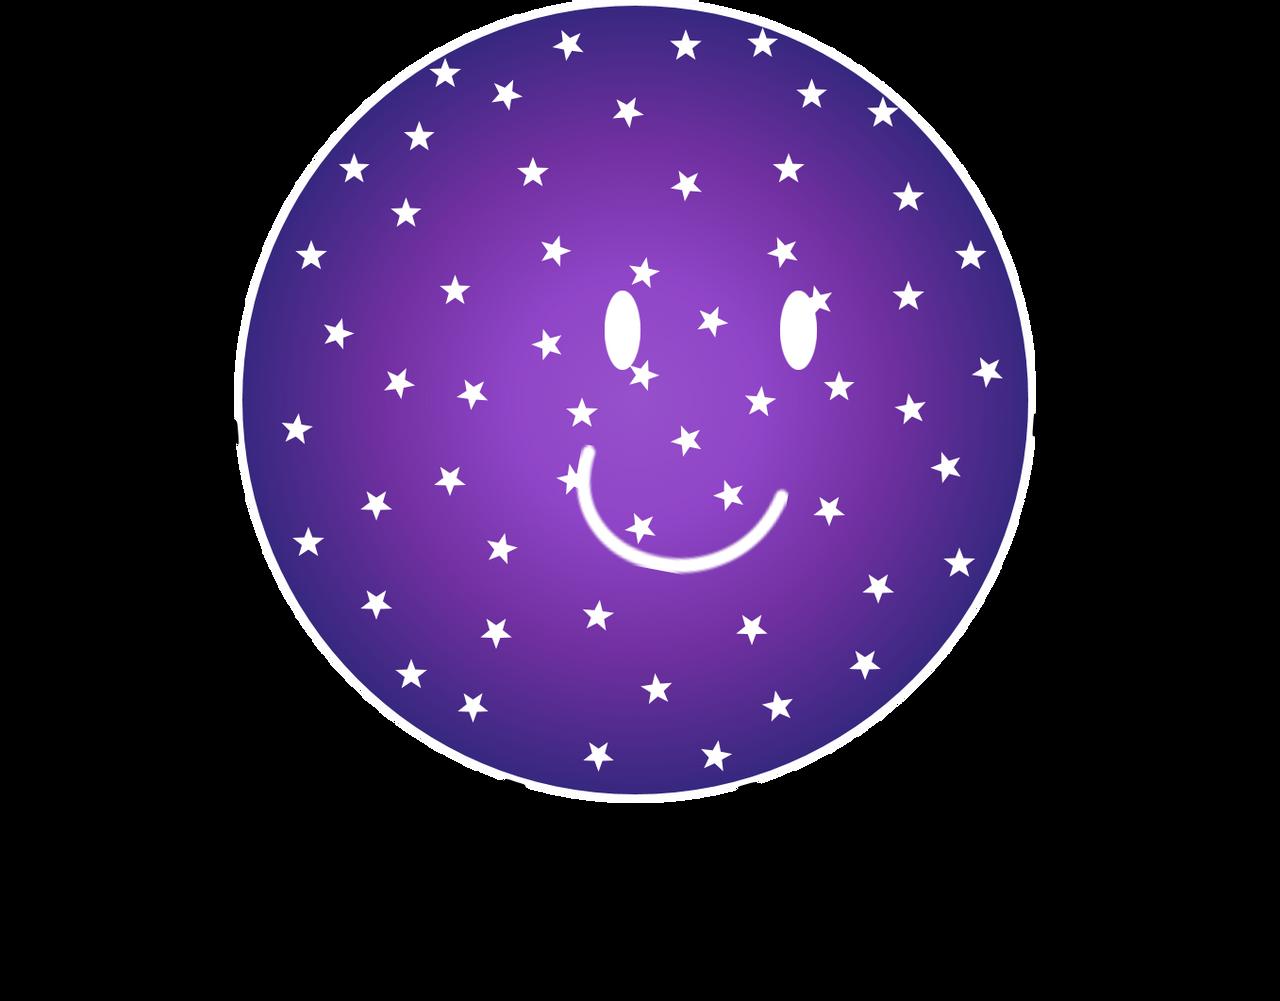 Cosmic circle by adrianmacha20005 de2juj1-fullview